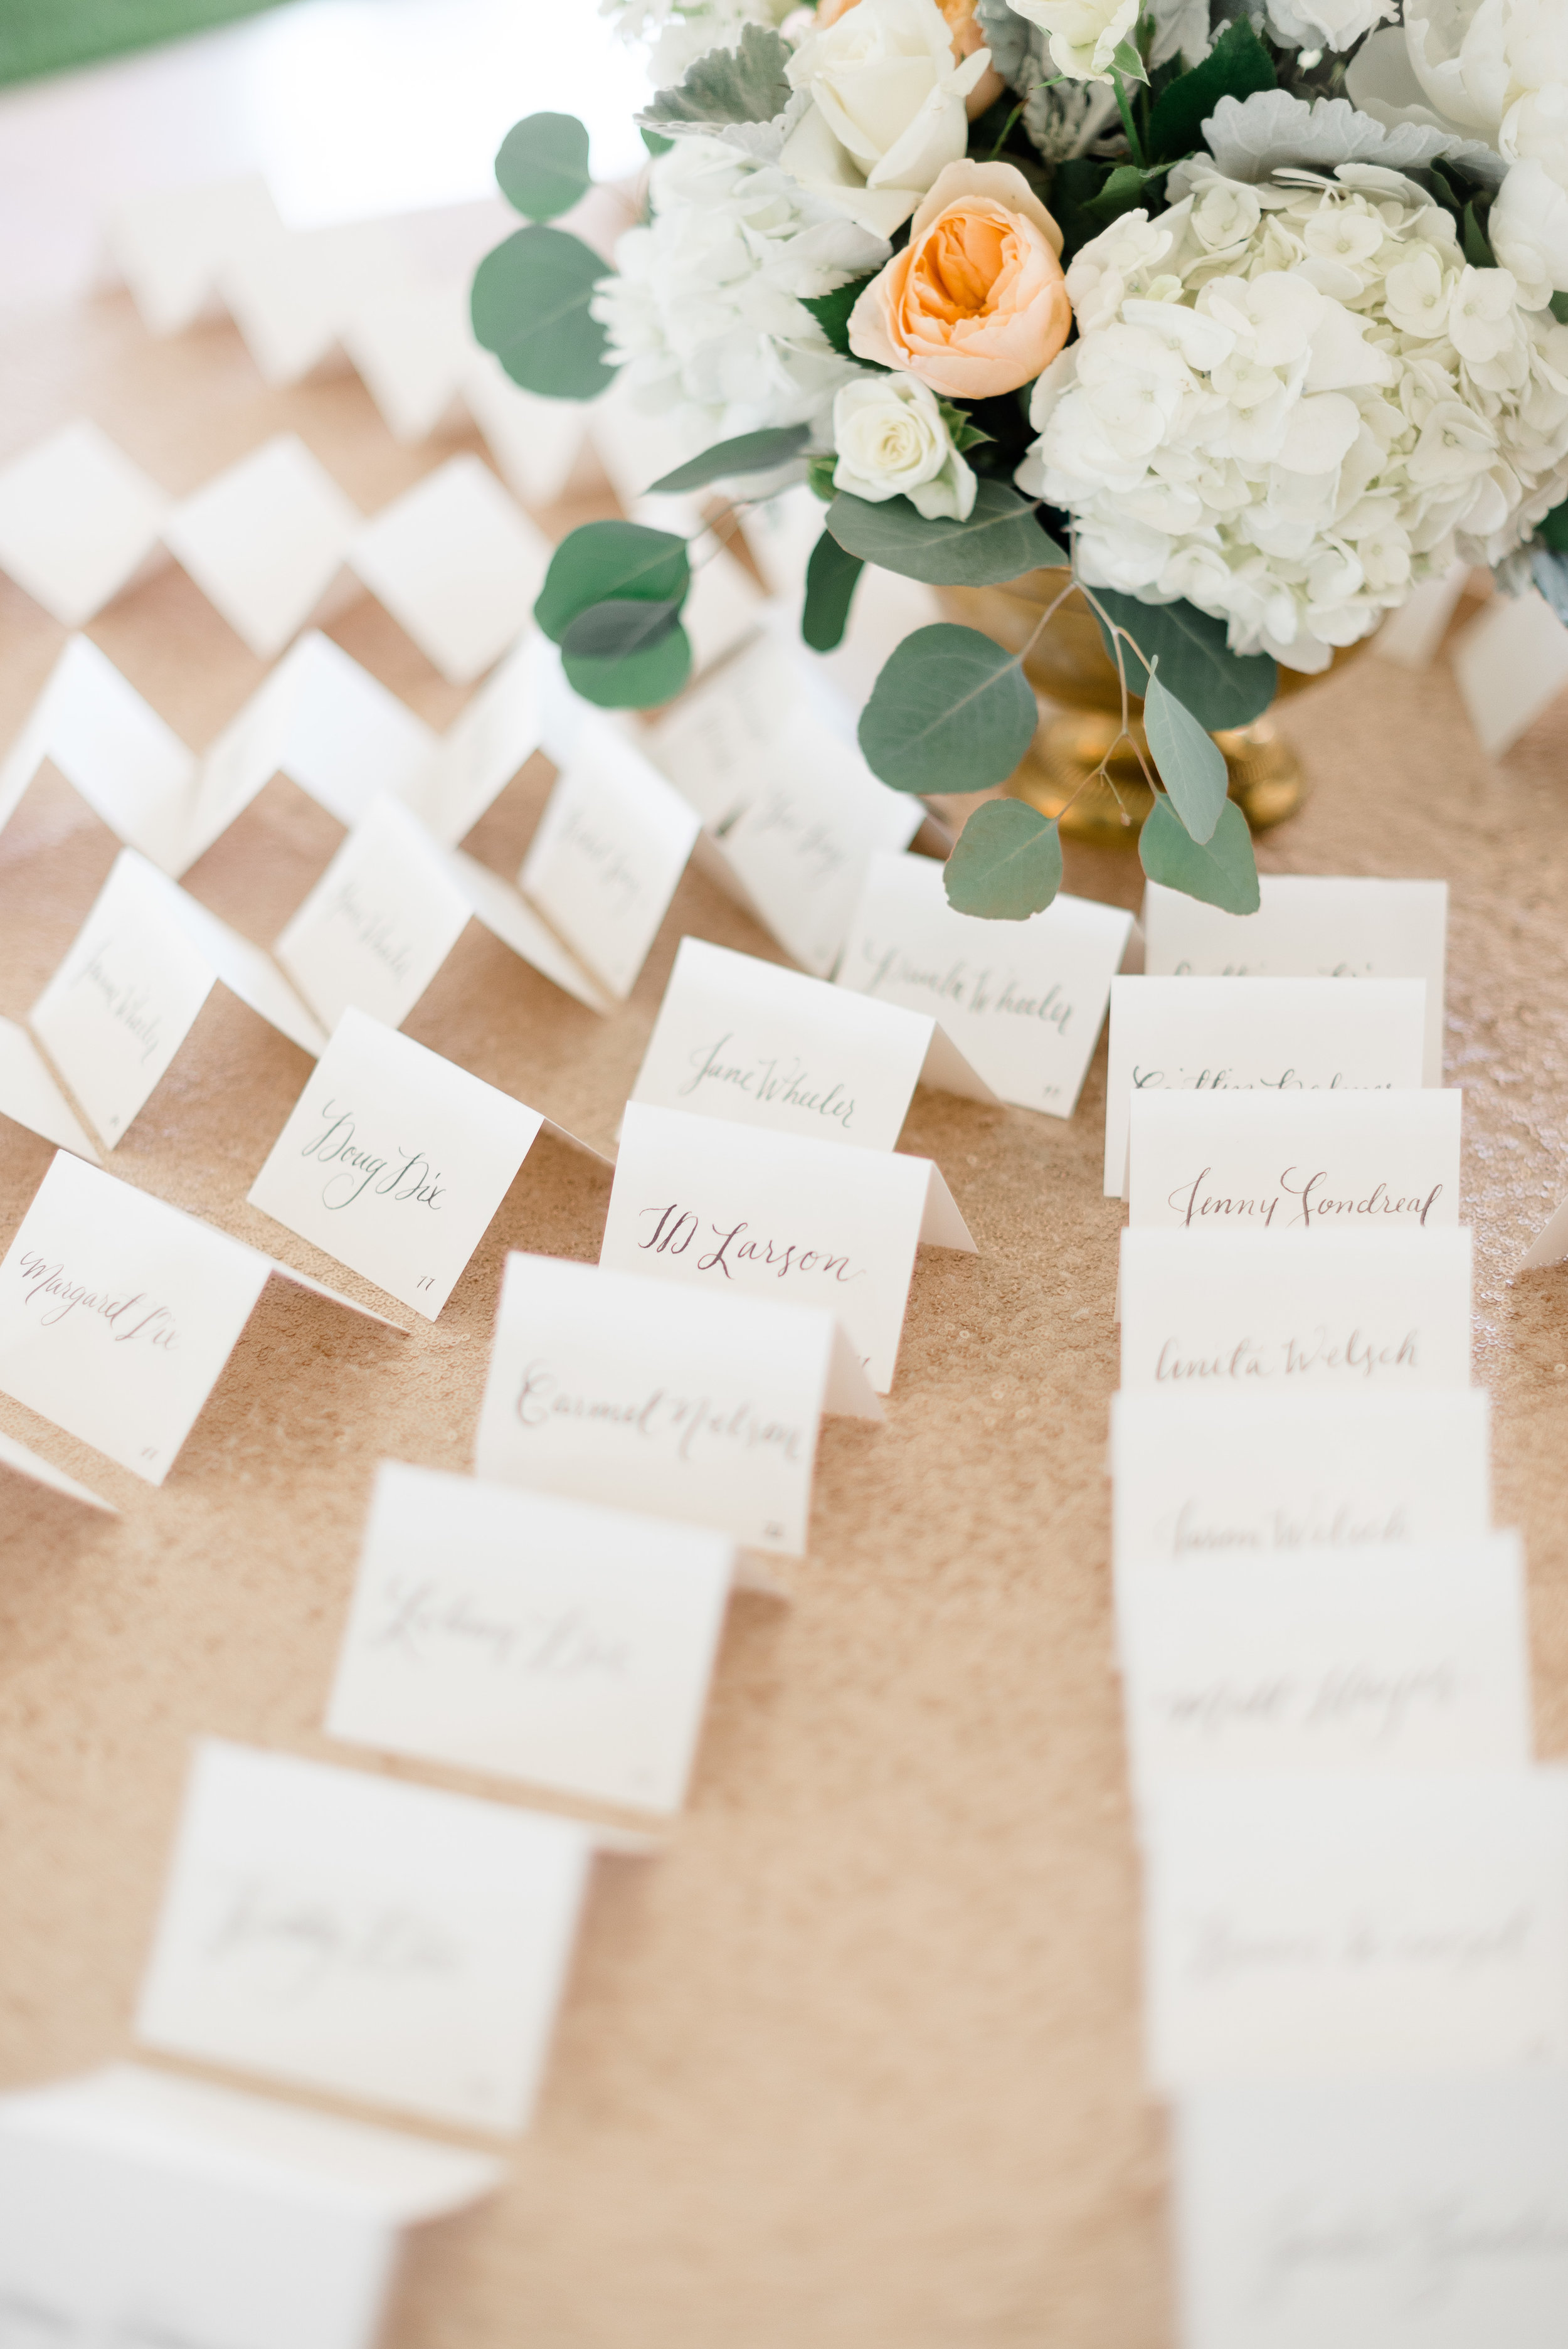 Anthony-and-stork-Weddings-398.jpg